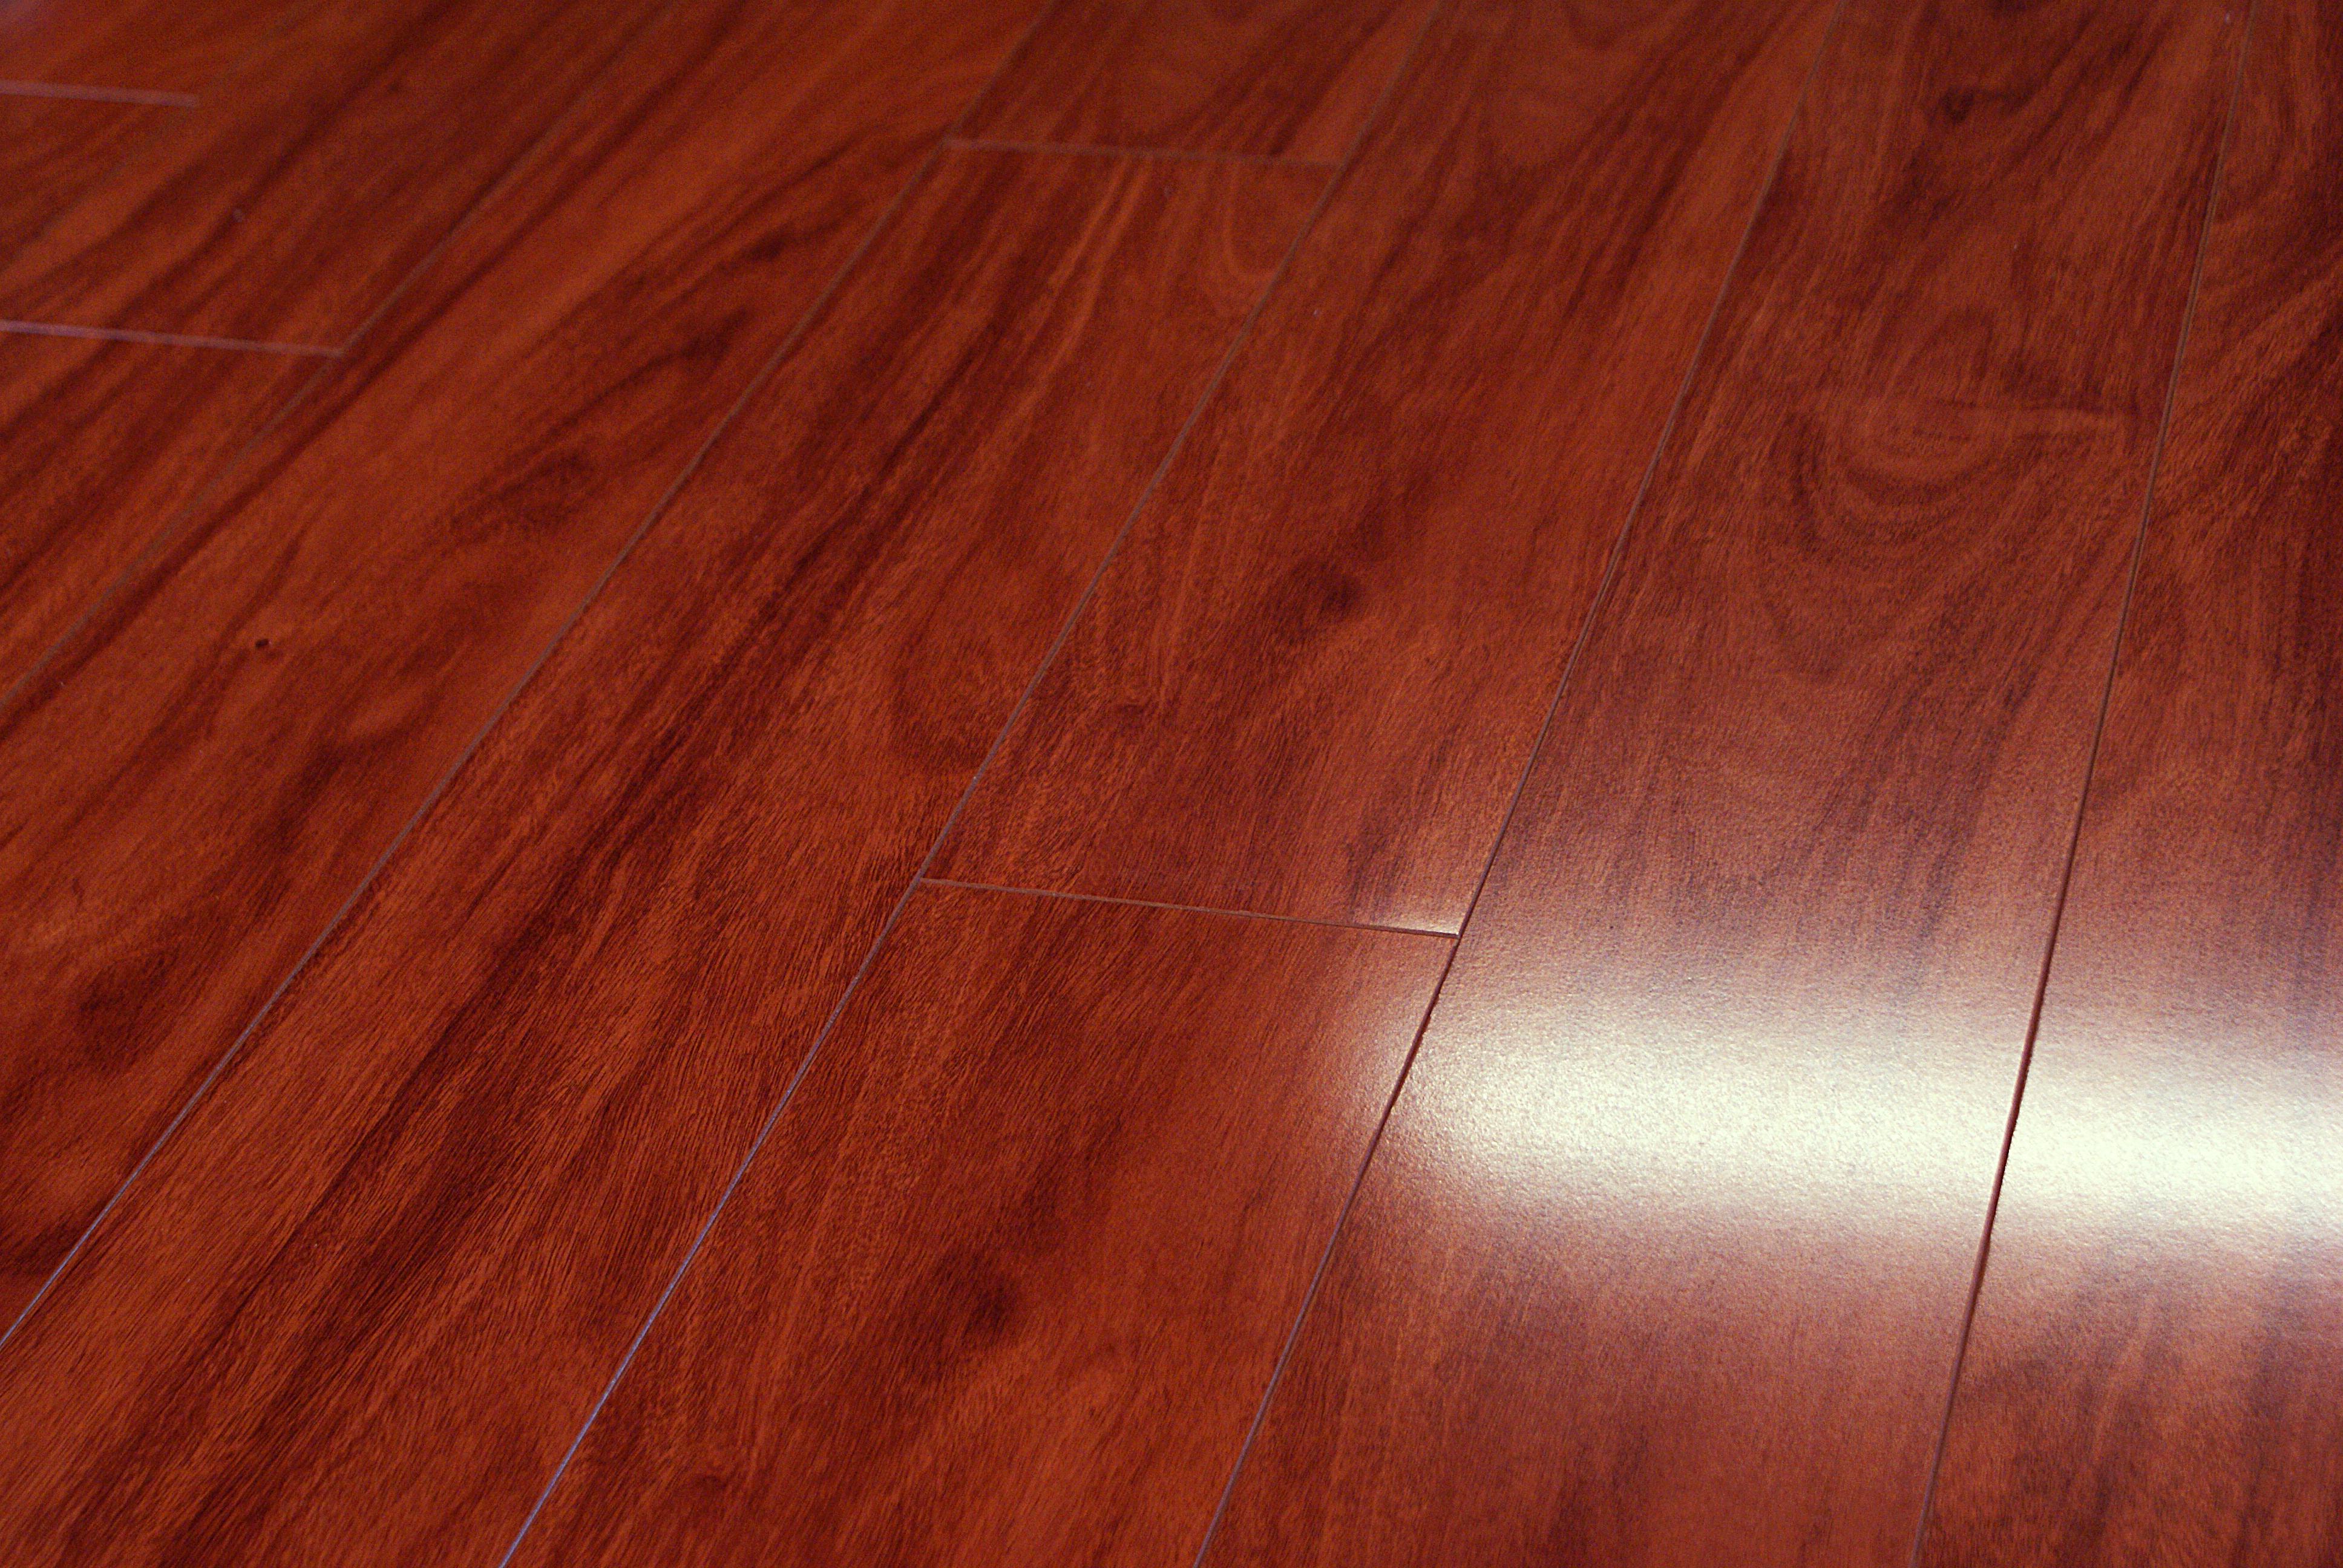 x odessa flooring home serradon killian pdx improvement in floors mahogany laminate